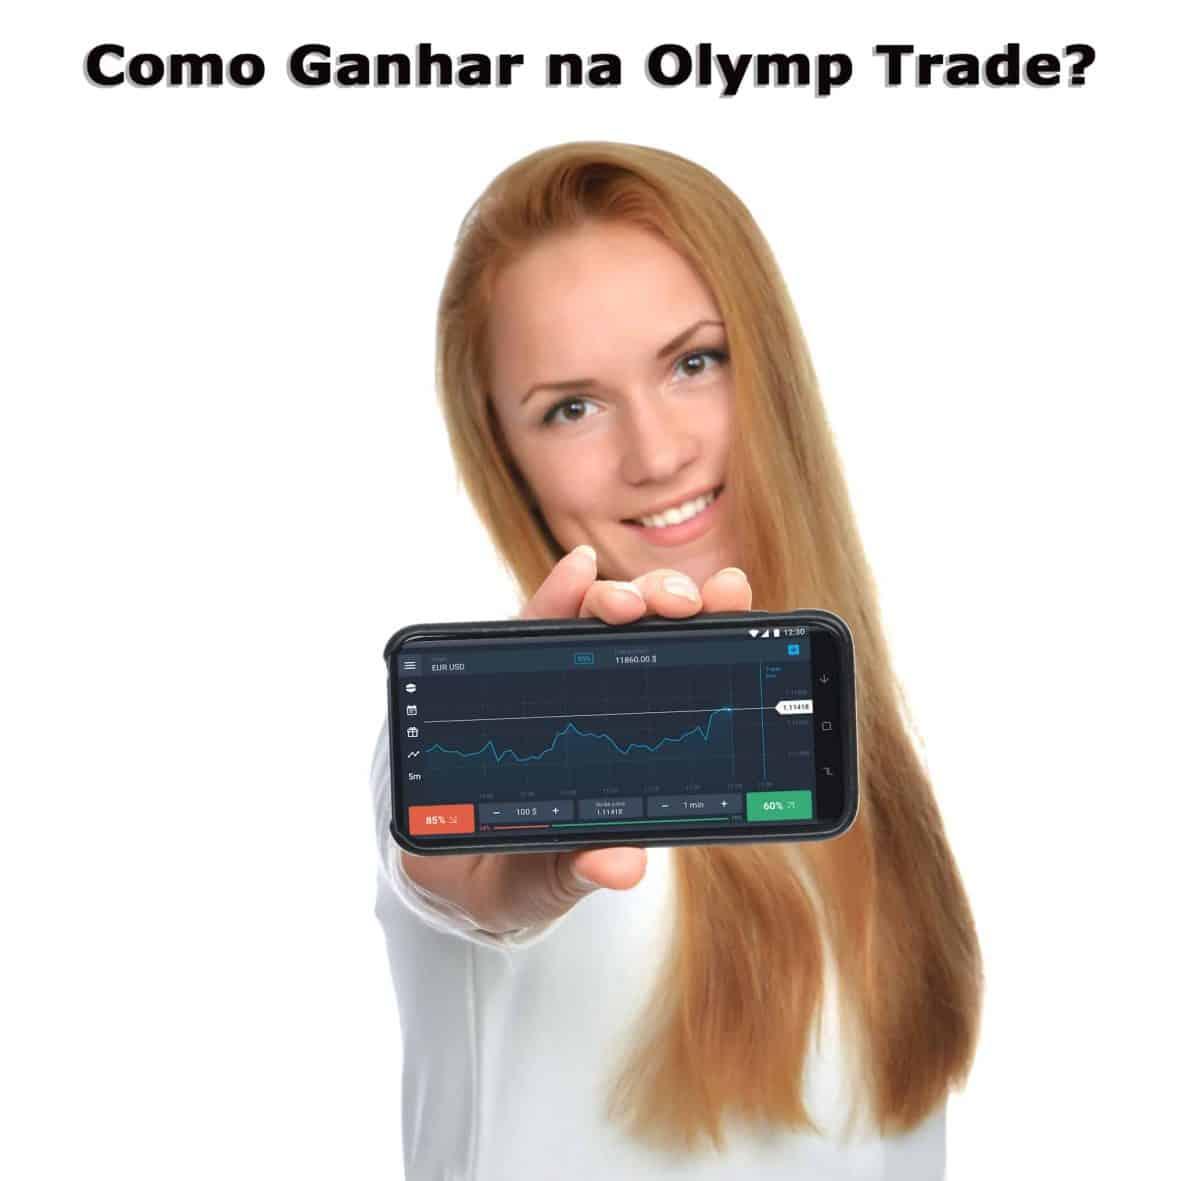 ganhar na olymp trade